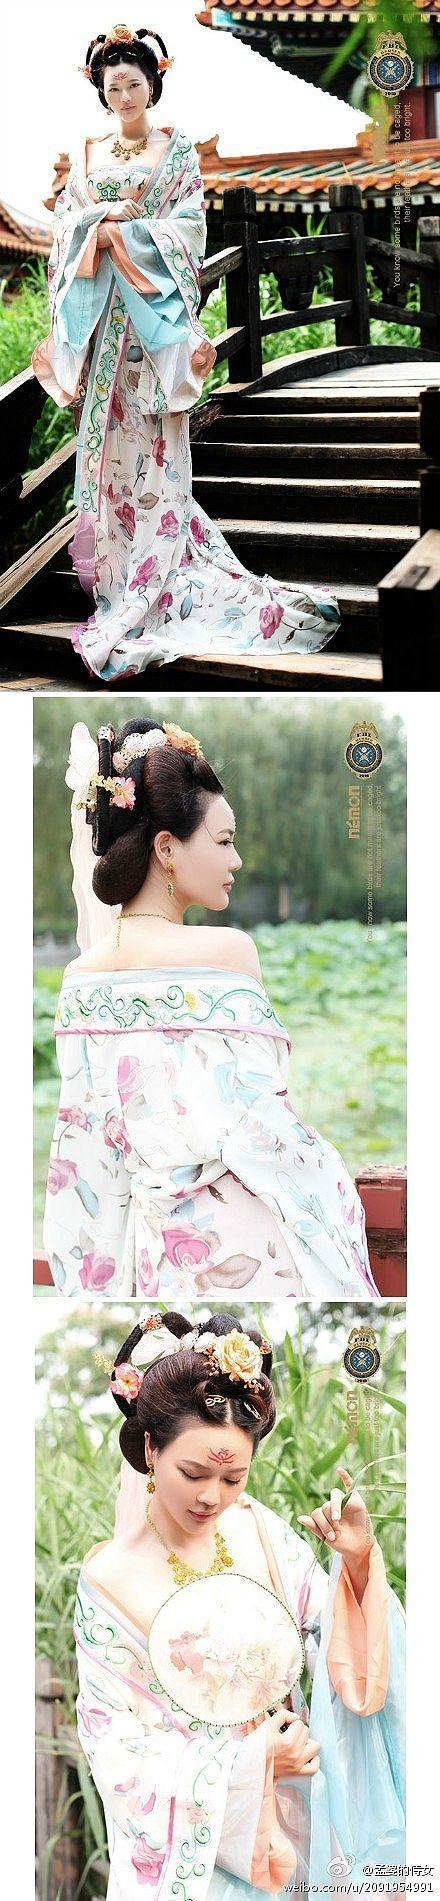 Hanfu: traditional Chinese costume.